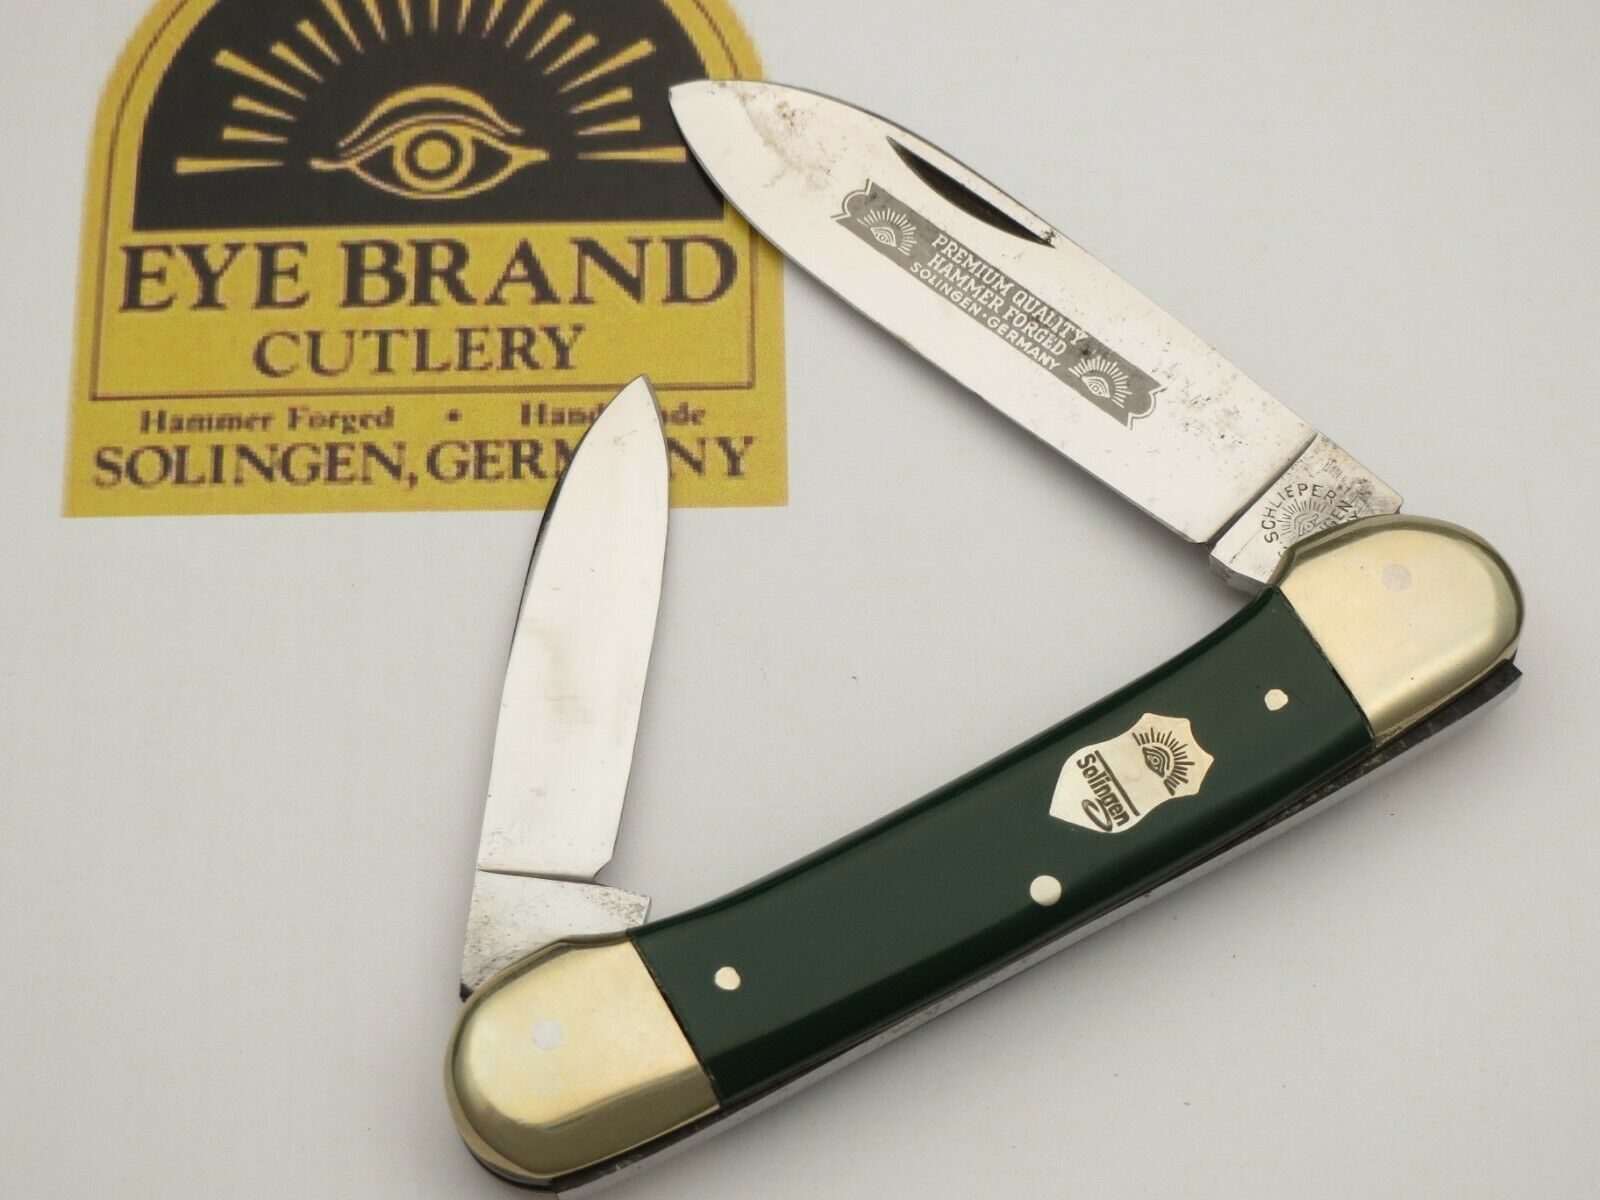 Vintage EYE BRAND Solingen Scarce Canoe Pocket Knife Green Handles Unused